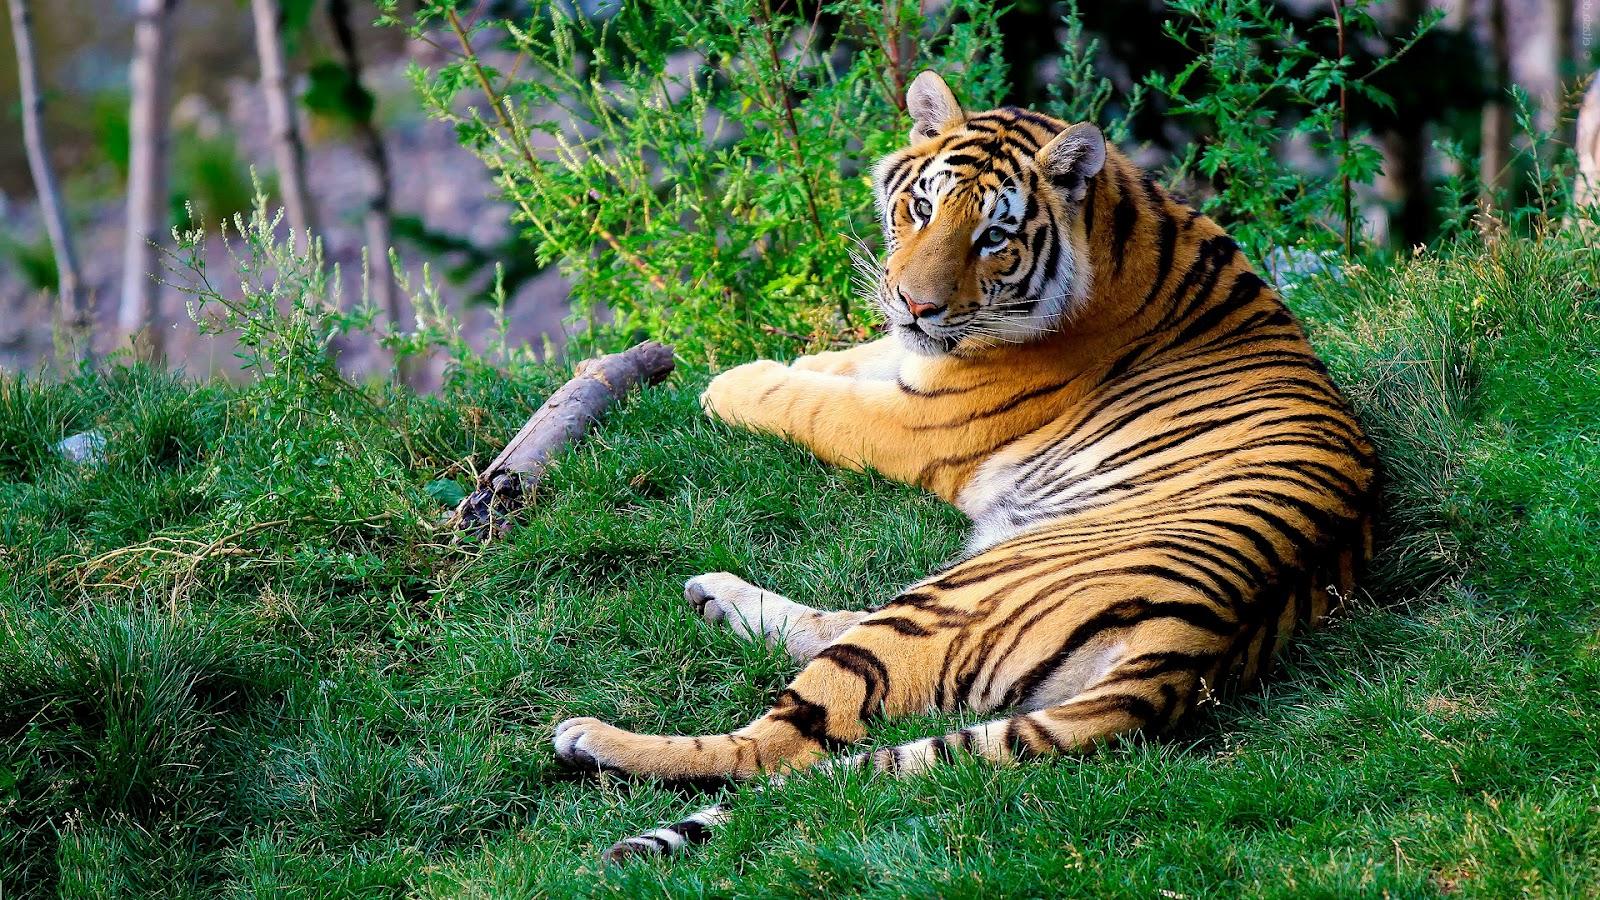 8k Animal Wallpaper Download: Top 35 Most Beautiful Tiger Wallpapers